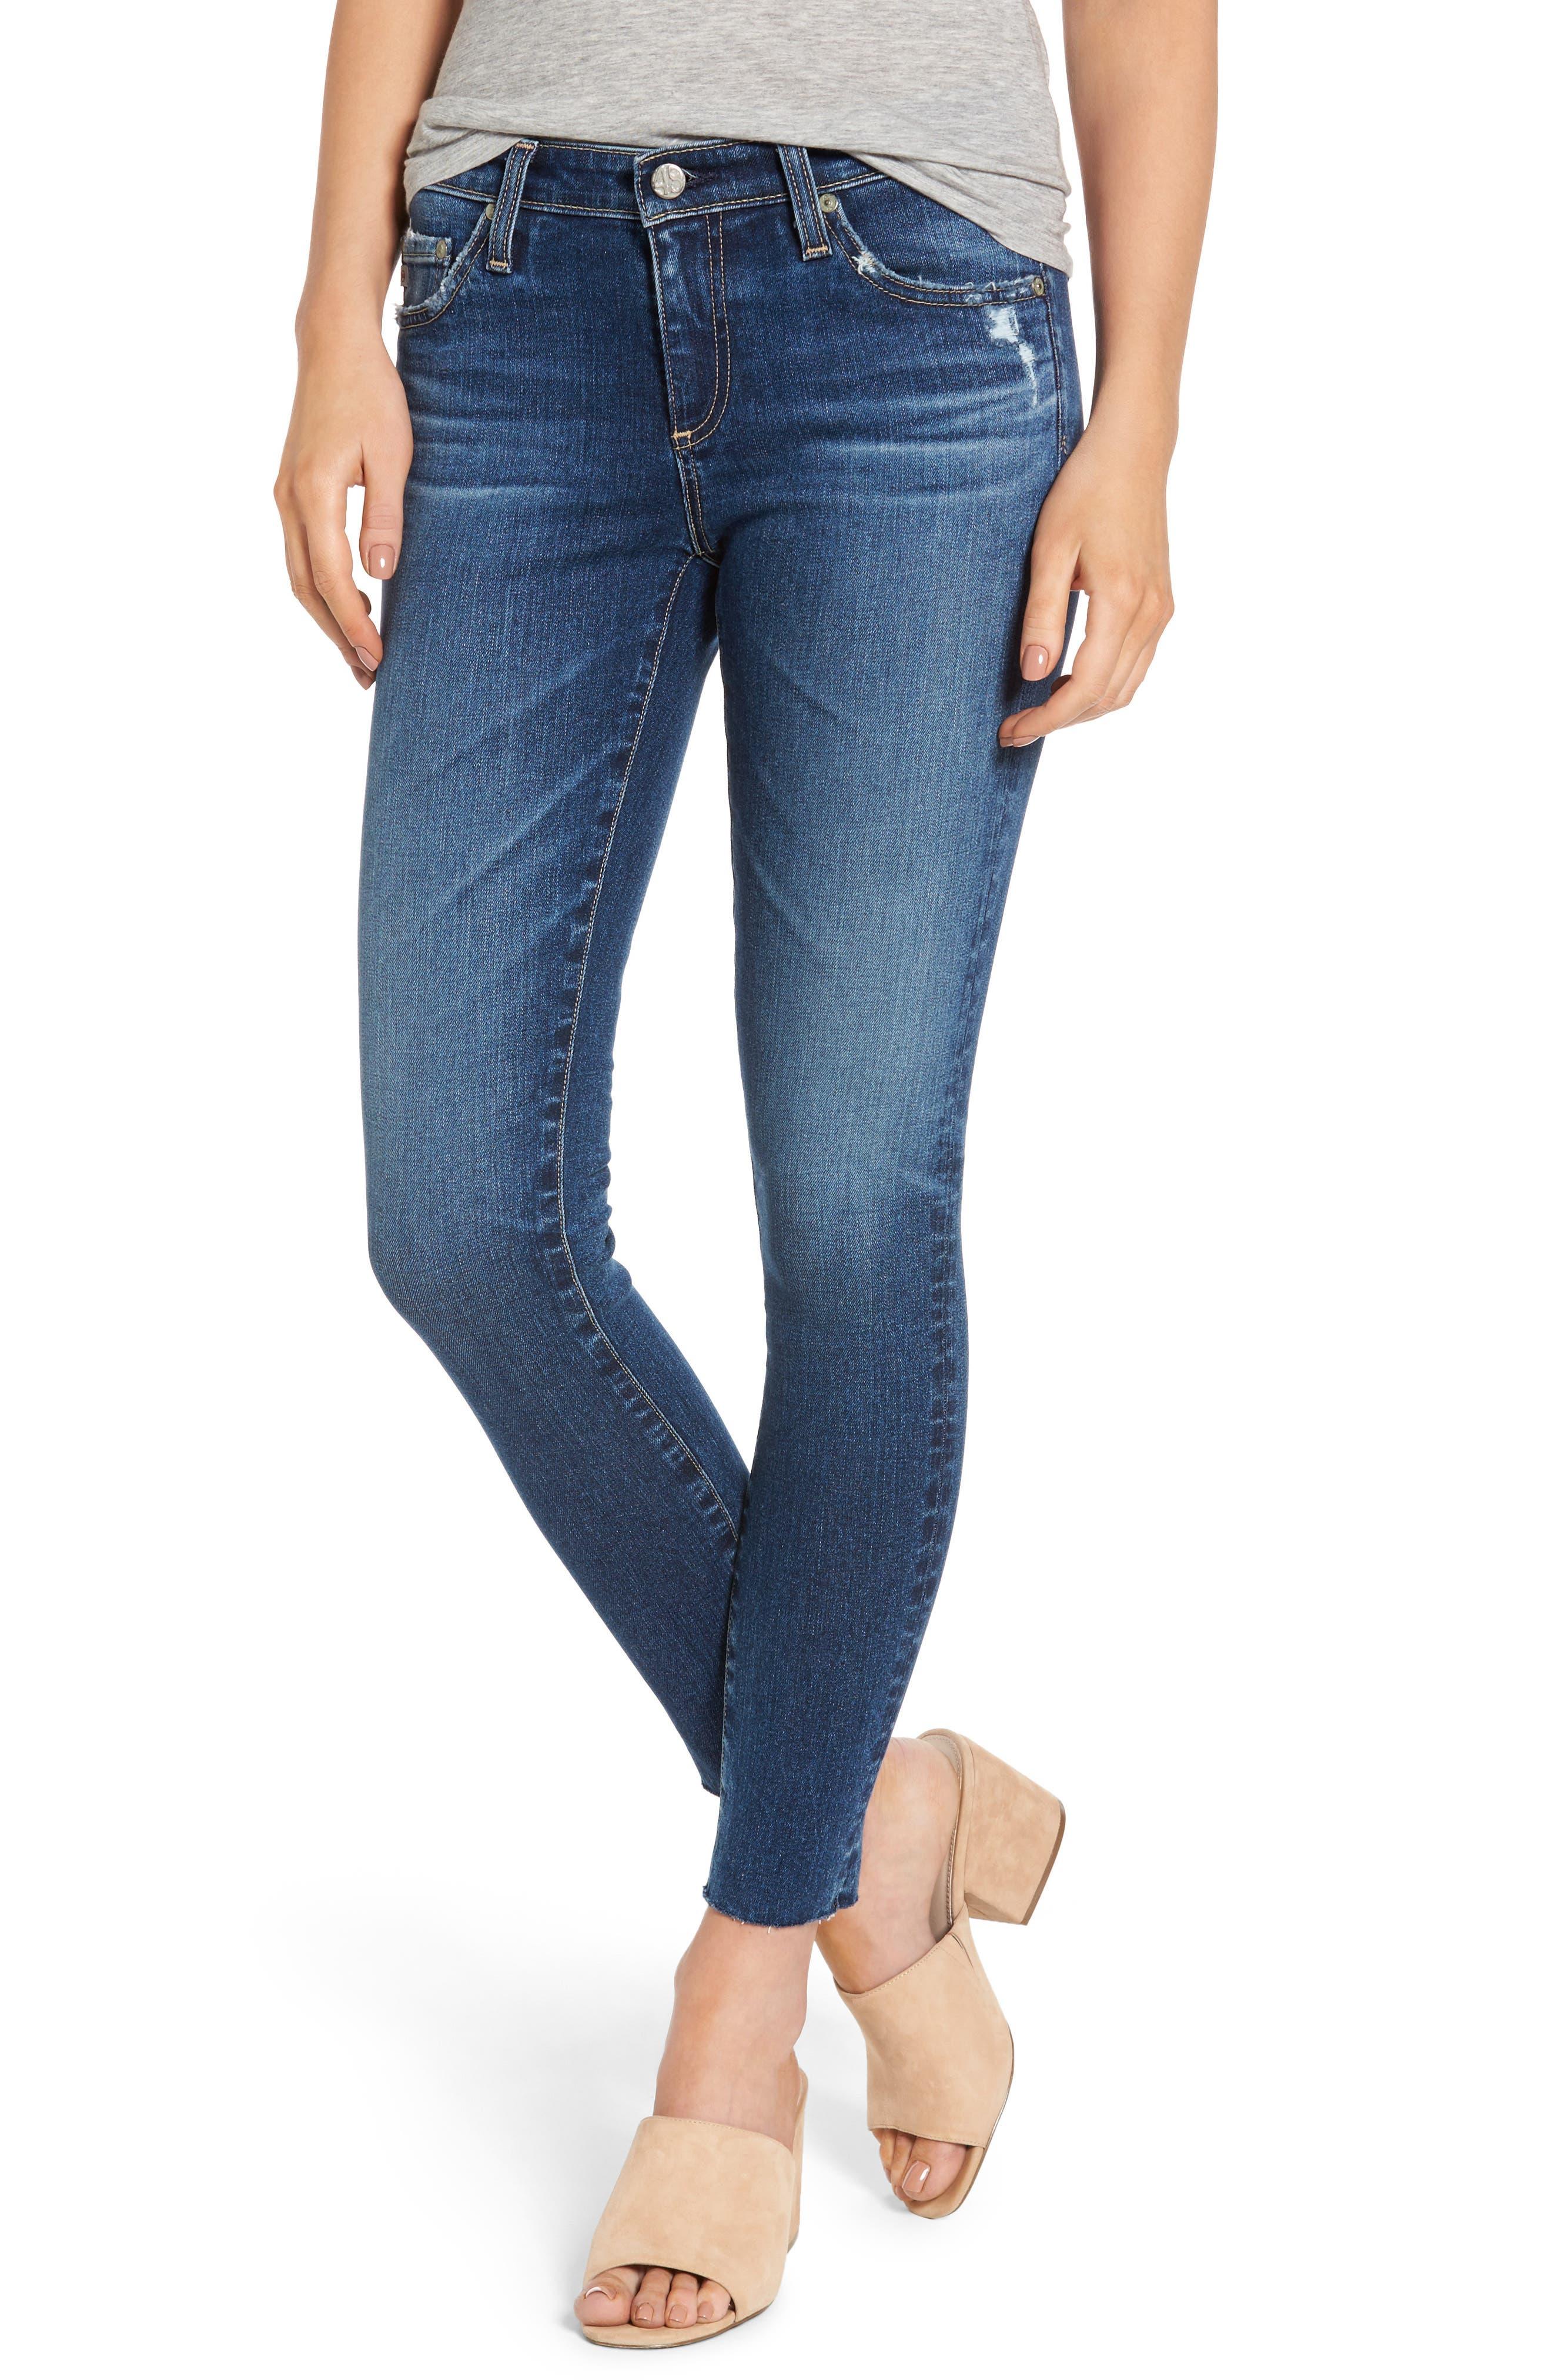 Womens Jeans Sale Nordstrom Bianca Top Leux Studio Silver L